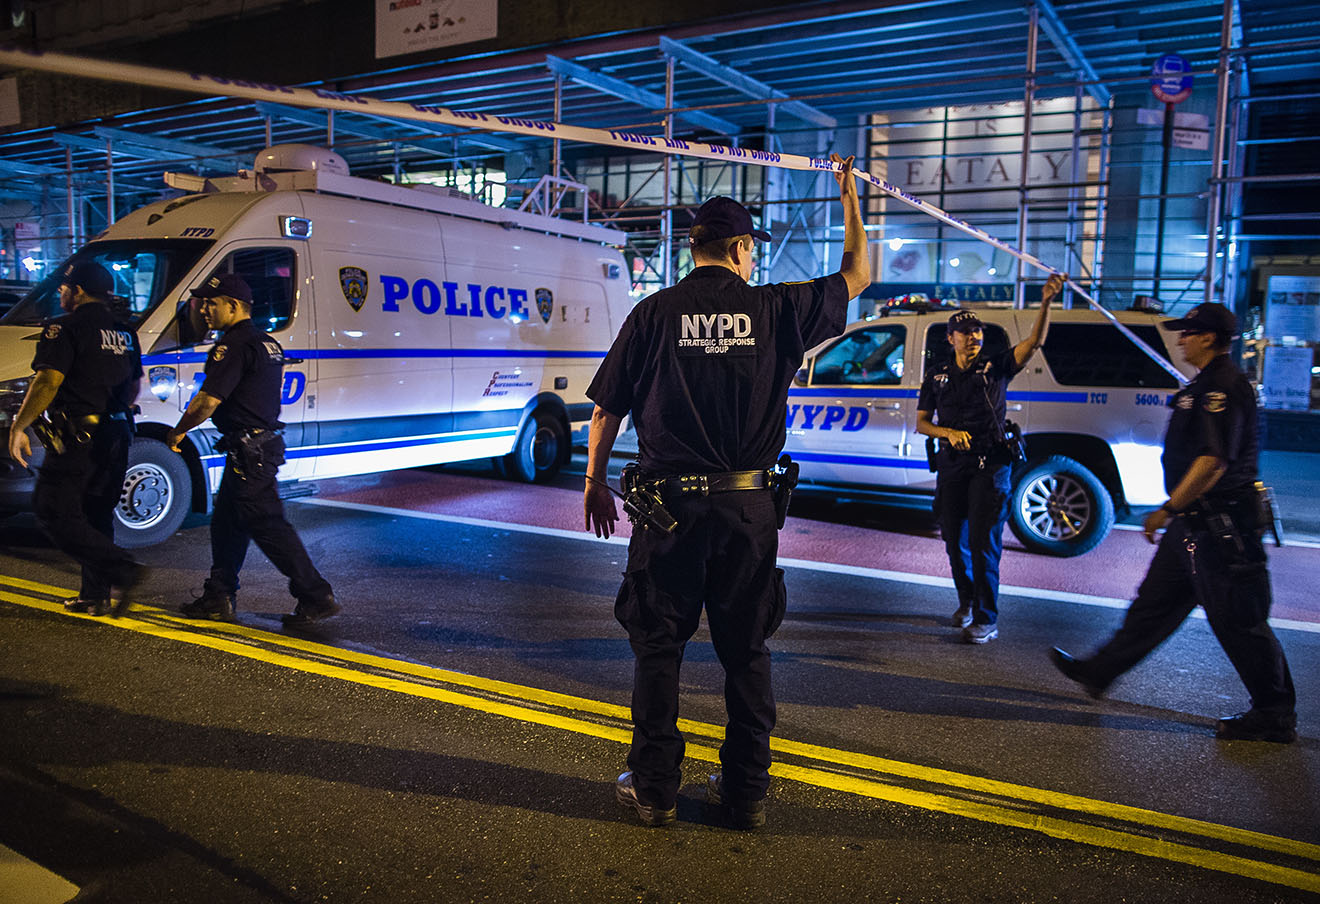 Полиция на месте взрыва в Нью-Йорке. Фото: Andres Kudacki / AP